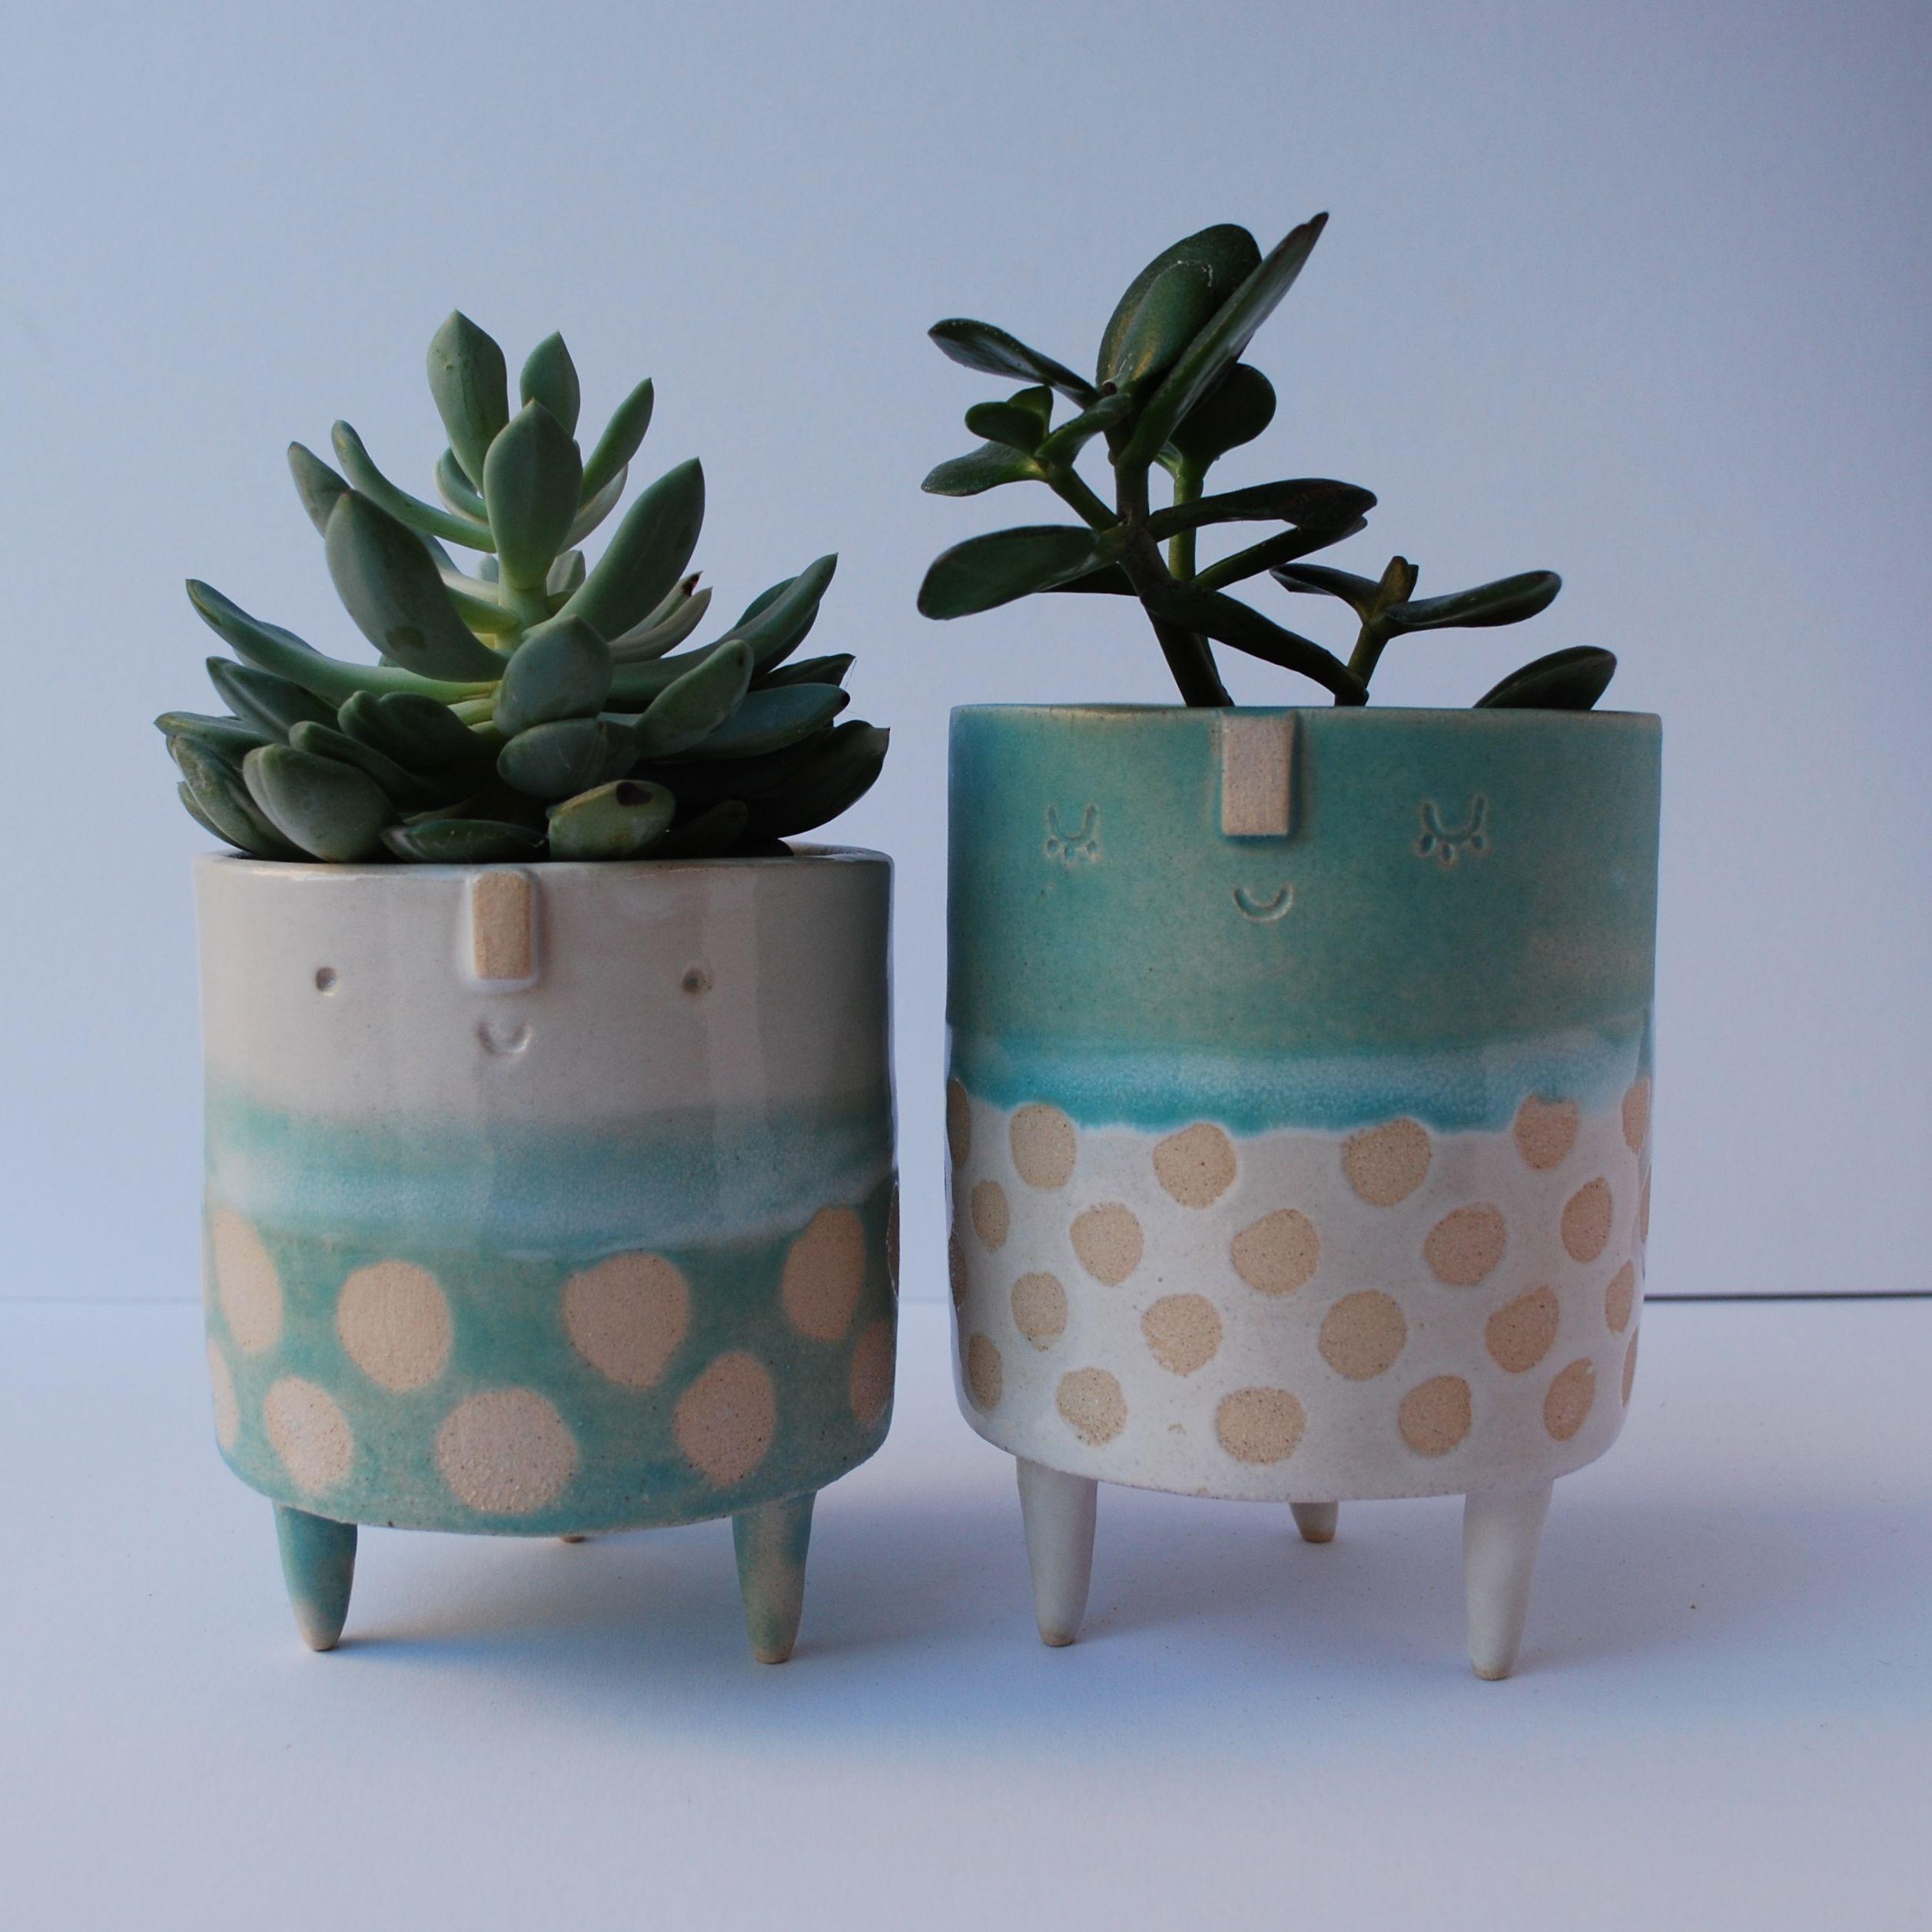 Atelierstella Pair Of Large Tripod Planters Turquoise White Spots Ceramic Flower Pots Ceramic Pottery Ceramic Art